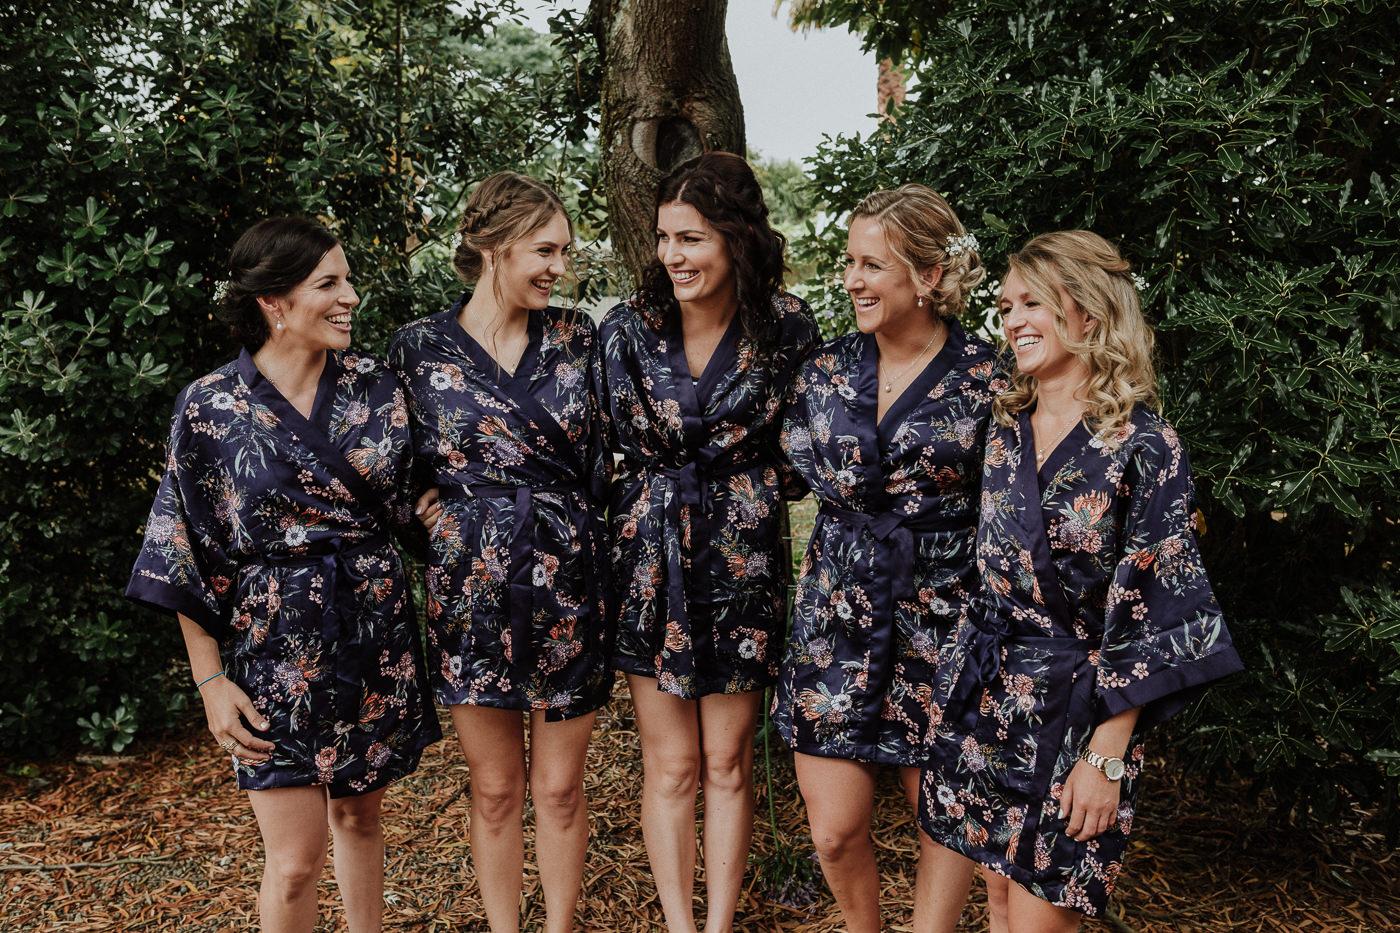 nz_wedding_photographer_gisborne-1009a.jpg